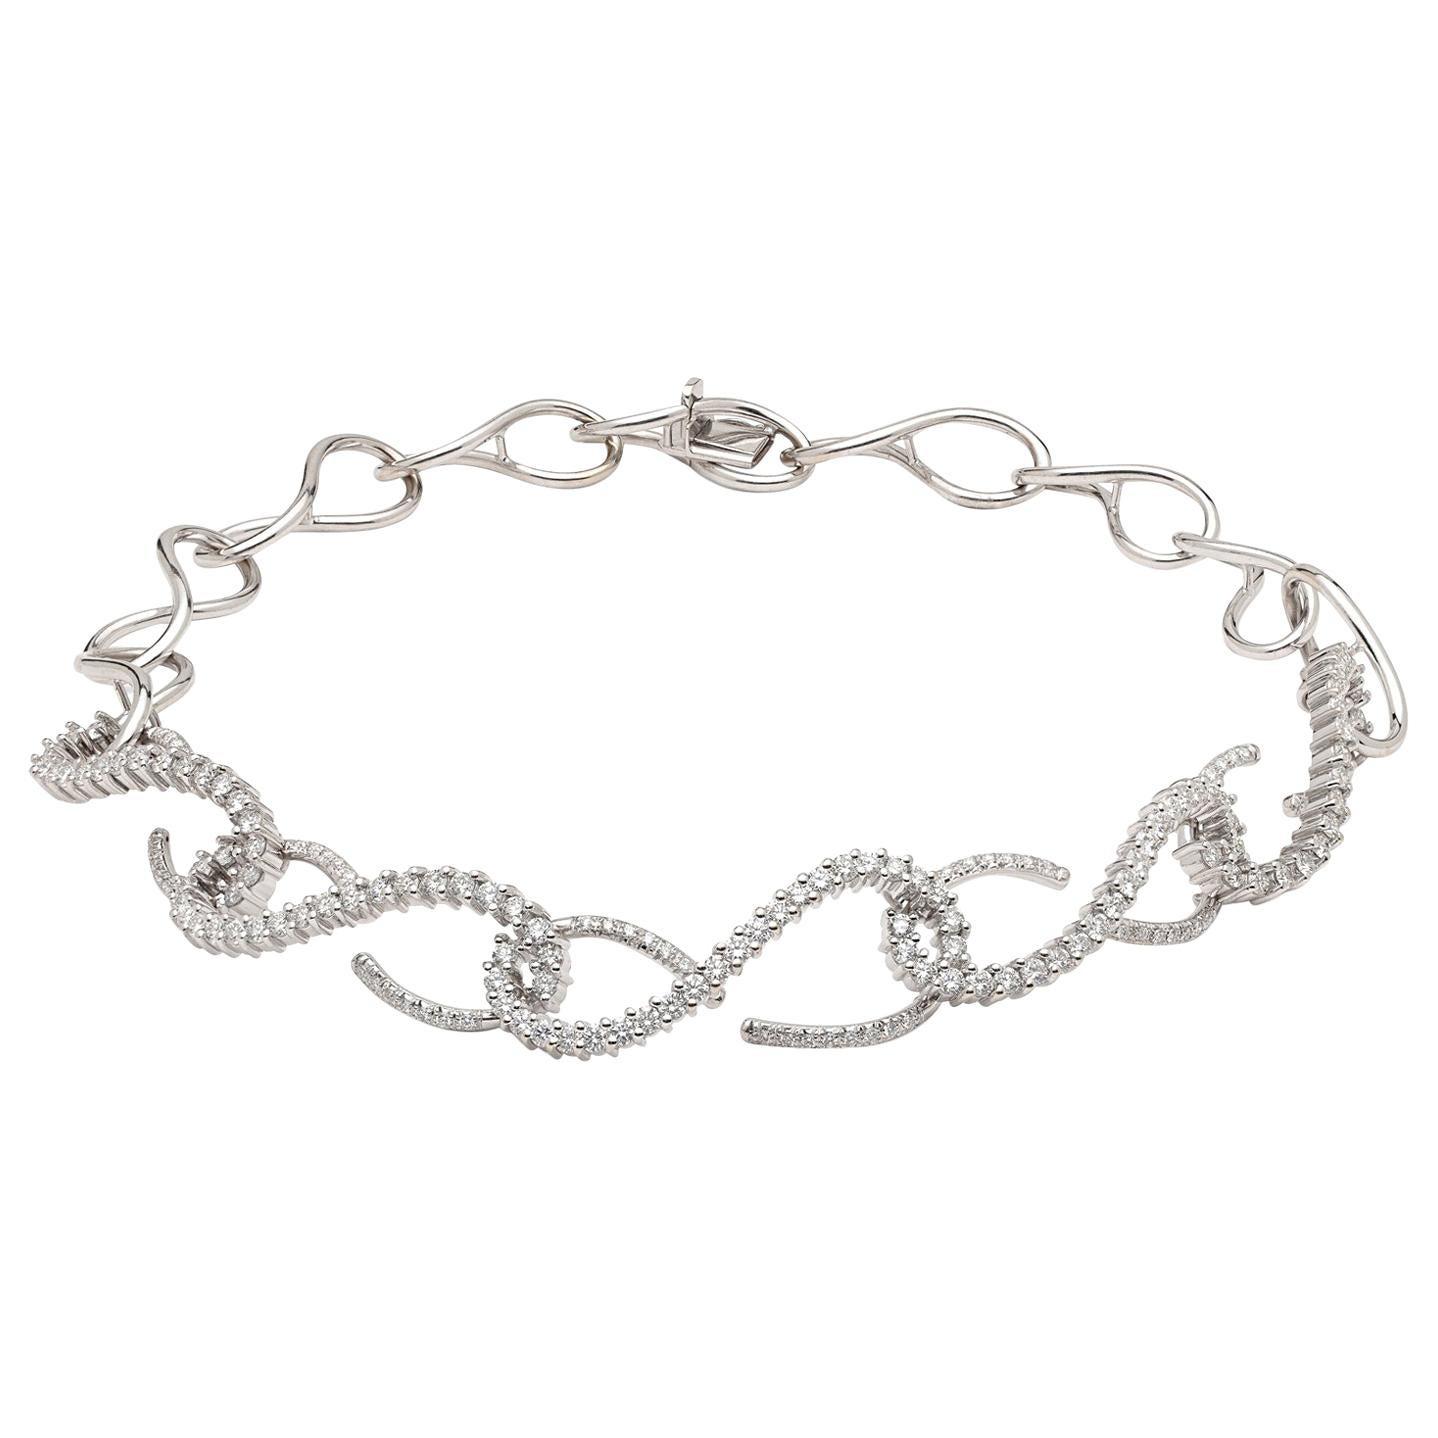 Diamond and 18 Karat White Gold Necklace